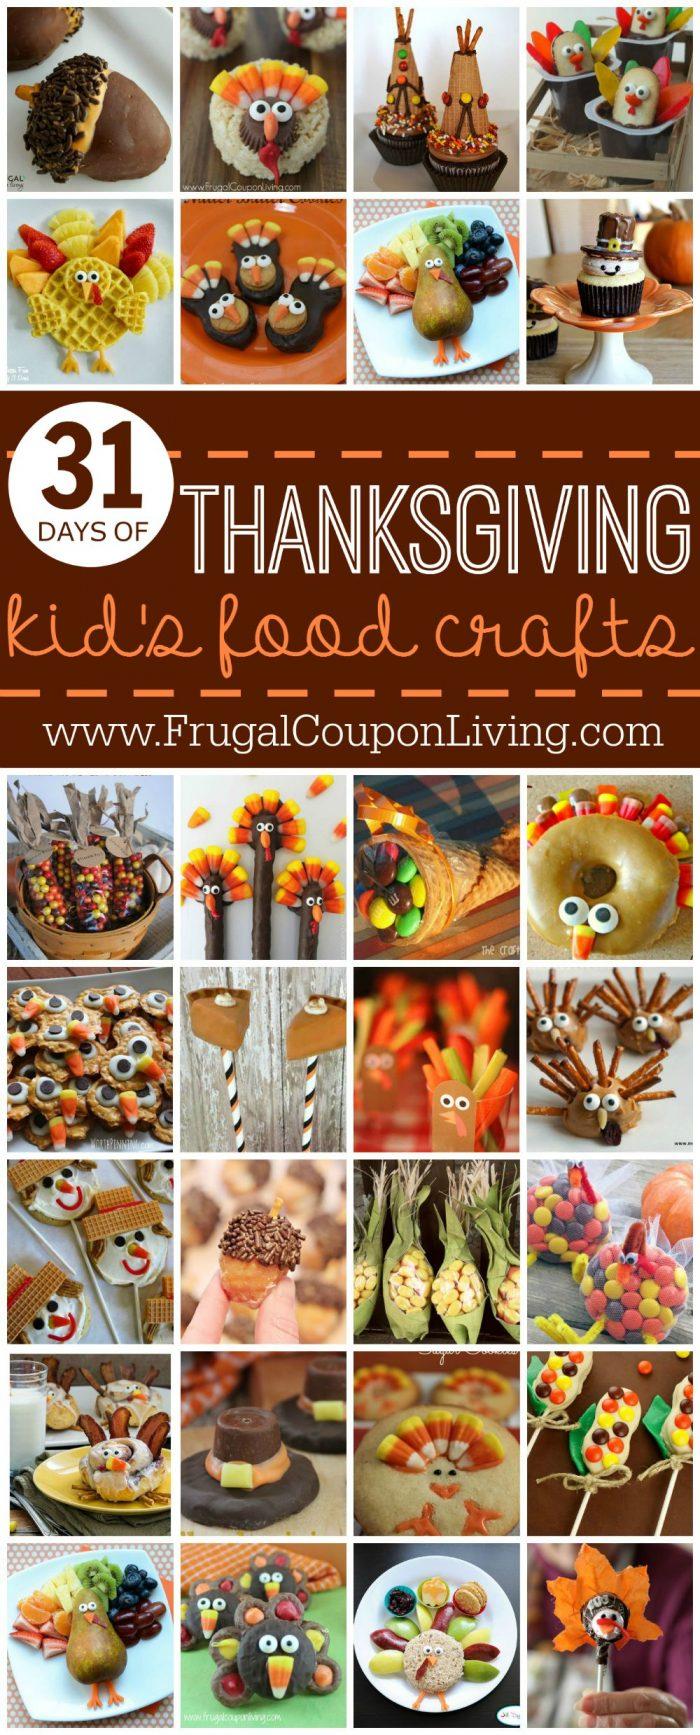 Thanksgiving Kids Food Crafts on Frugal Coupon Living